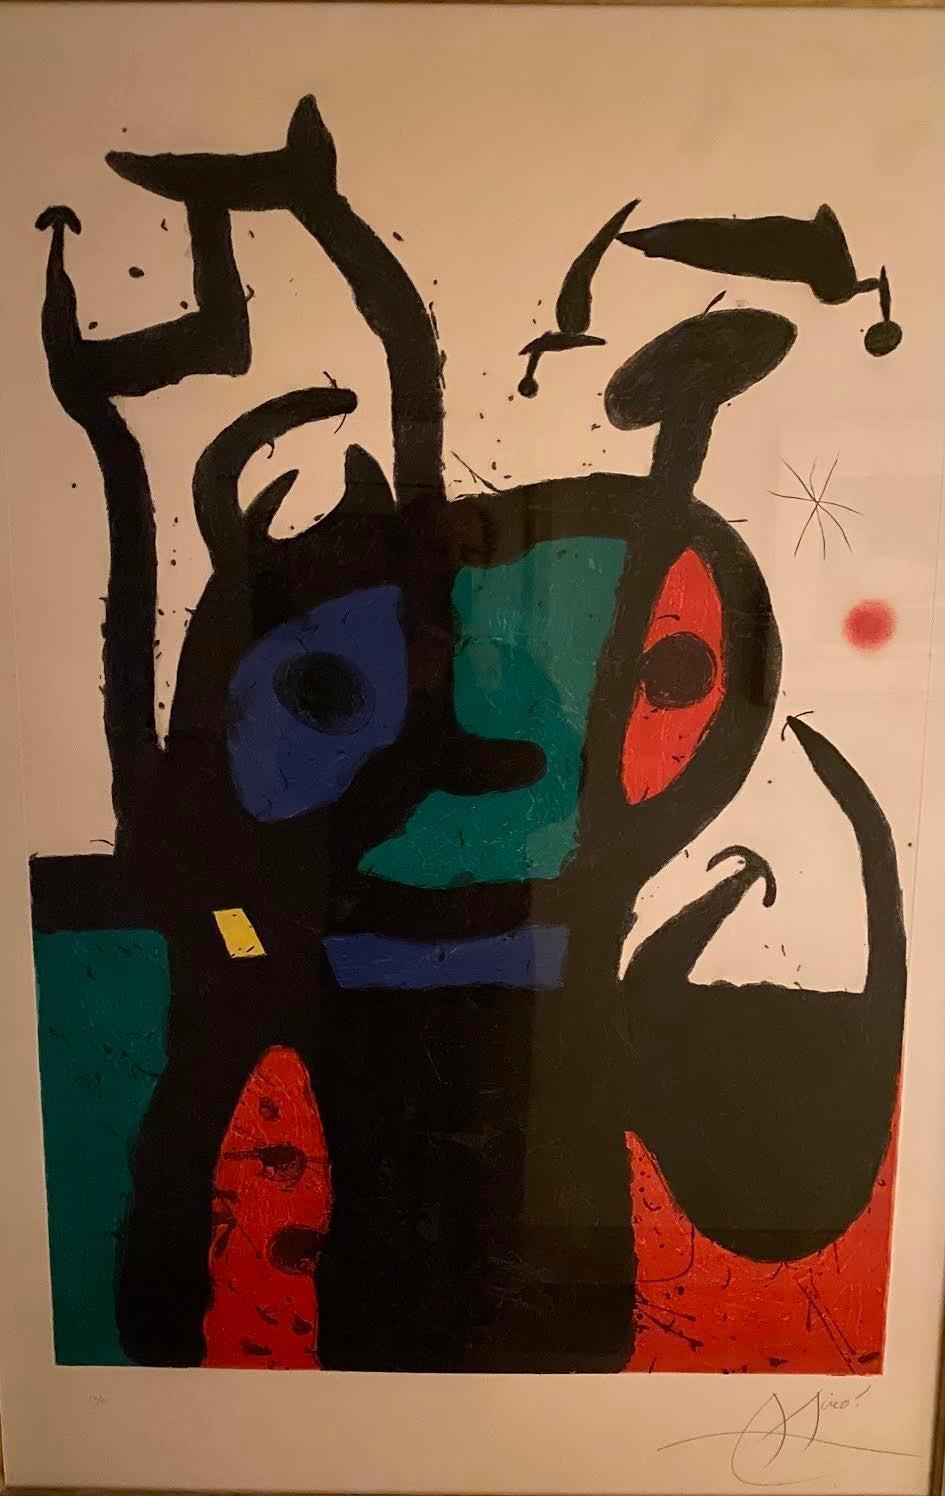 Joan Miro, Le Matador, etching